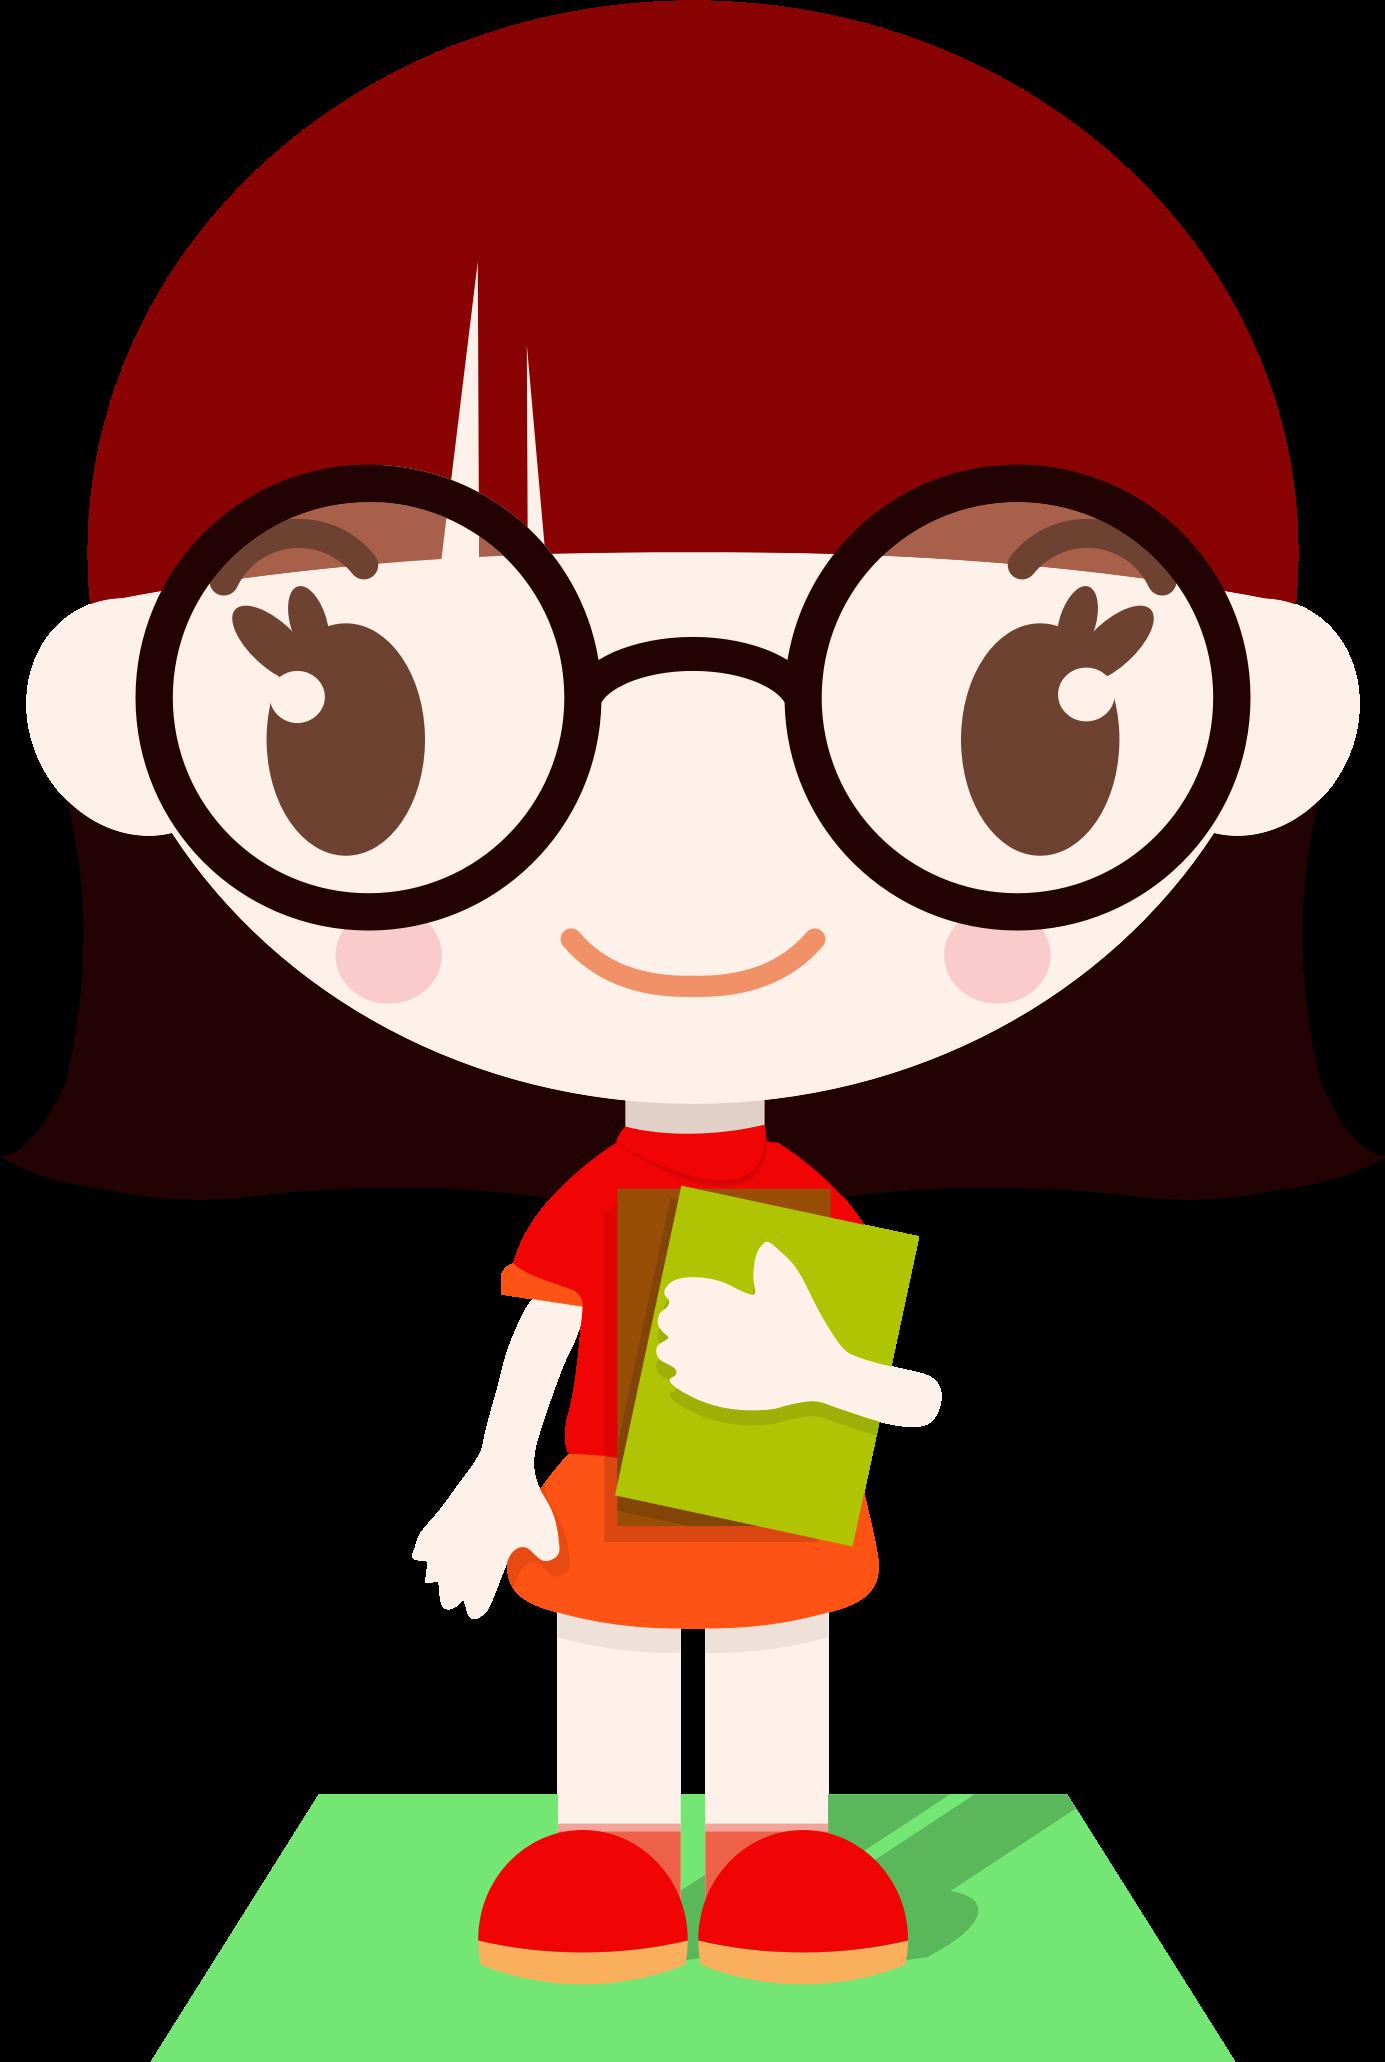 Wear glasses clipart library Free Girl Glasses Cliparts, Download Free Clip Art, Free ... library